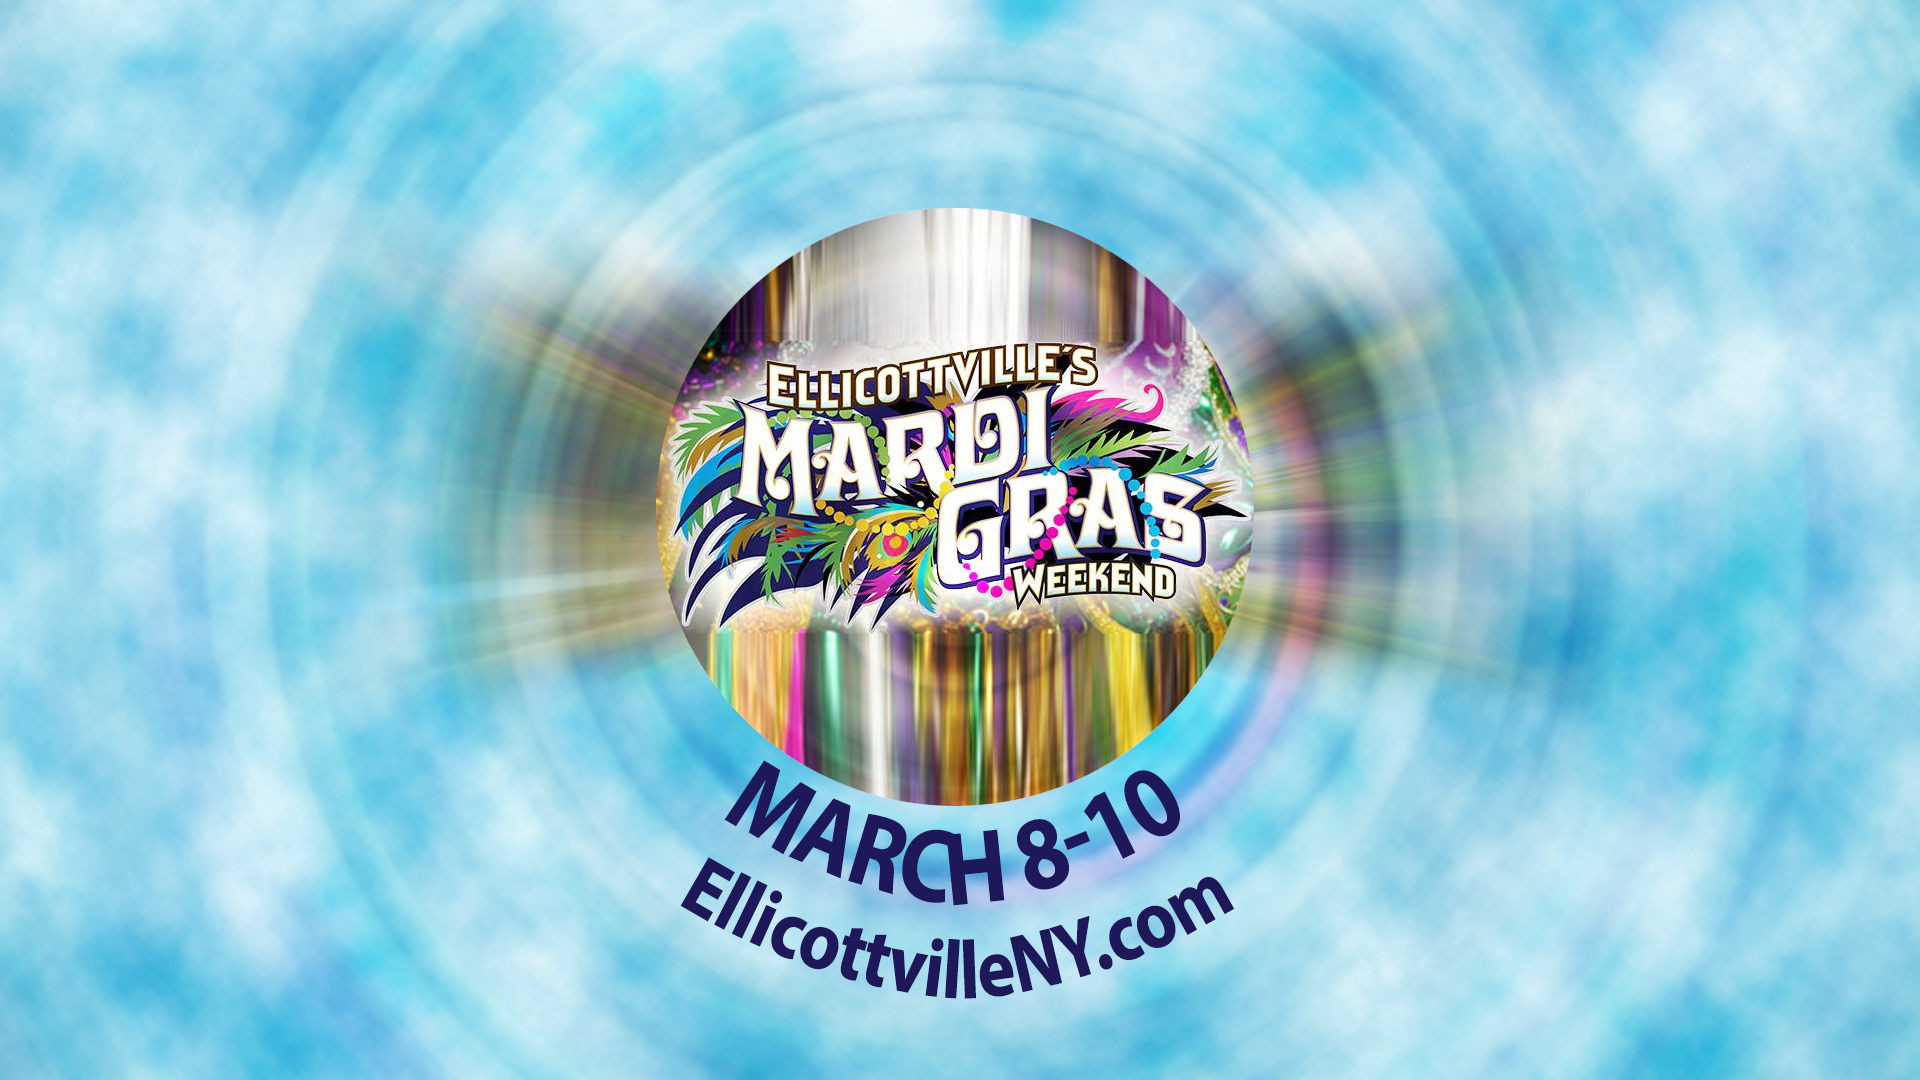 Ellicottville's Mardi Gras Weekend 2019